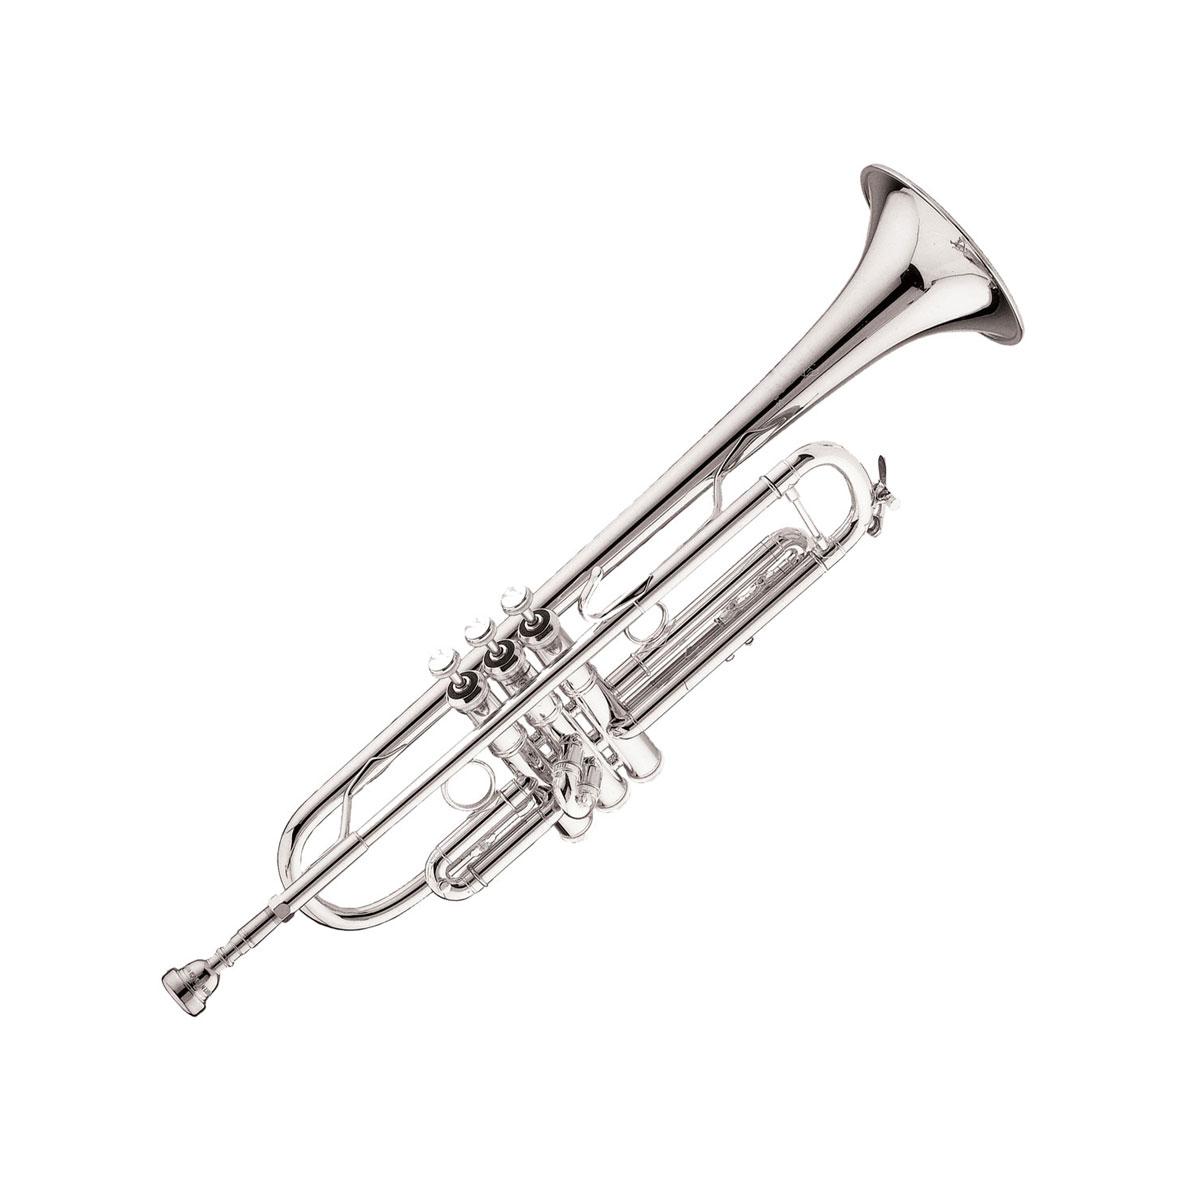 Bach / NEWYORK 7 SP バック ニューヨーク7 トランペット B♭ シルバーメッキ仕上 【お取り寄せ】【5年保証】